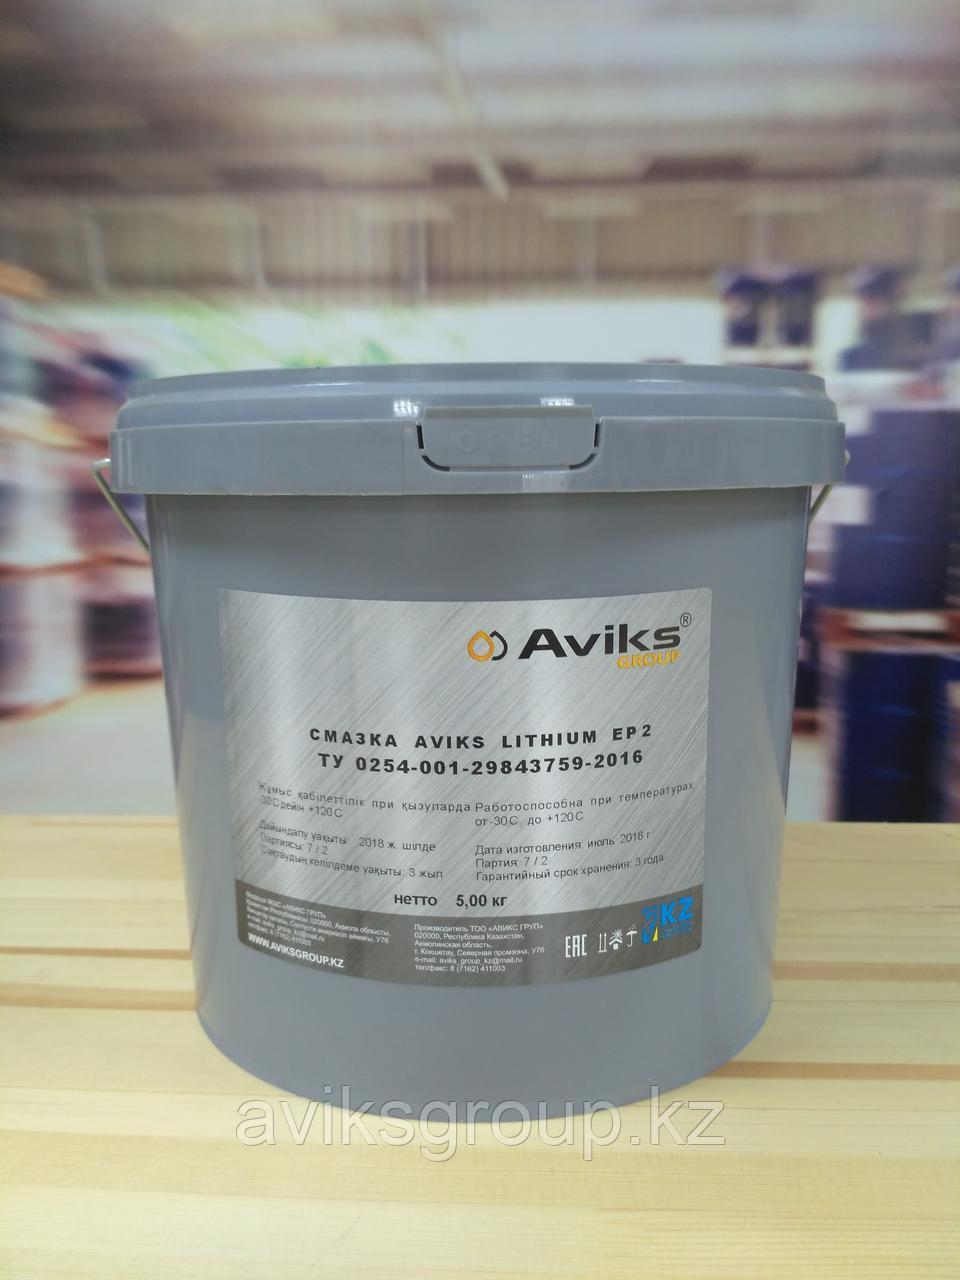 Смазка AVIKS Lithium EP ,ведро 5 кг